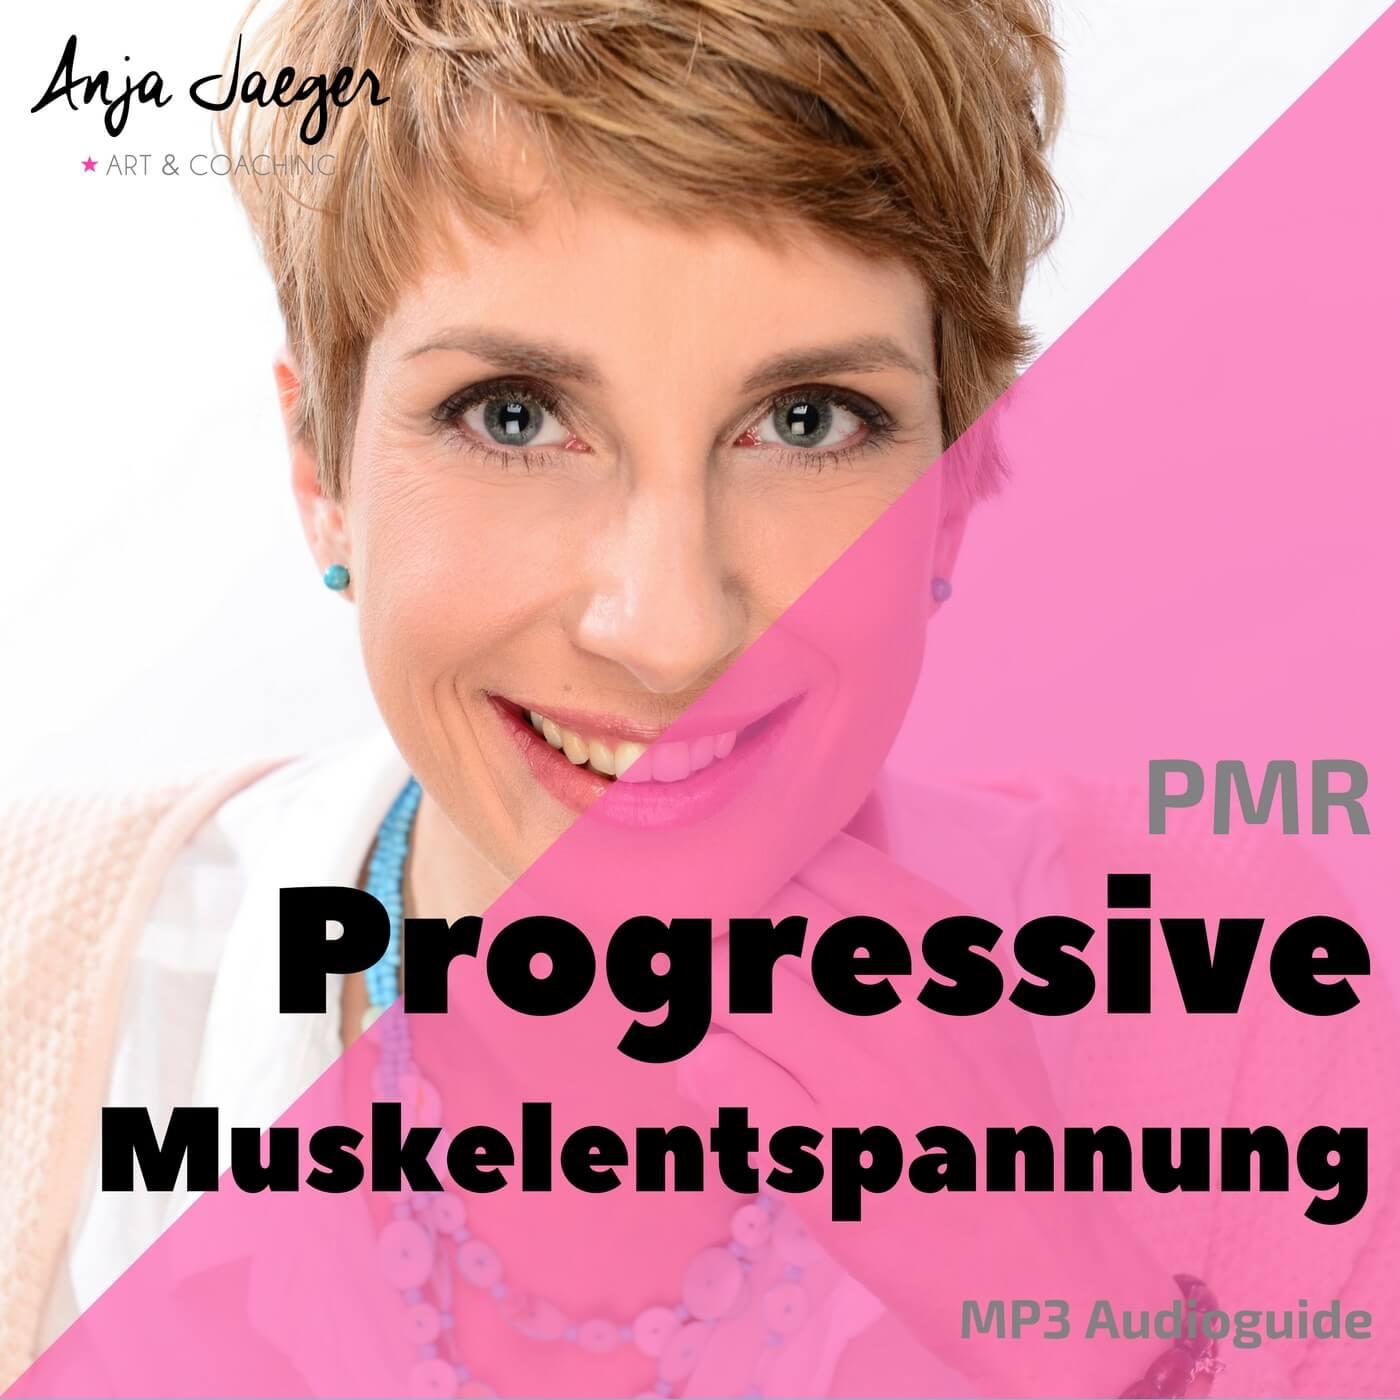 MP3 Audio Guide Cover